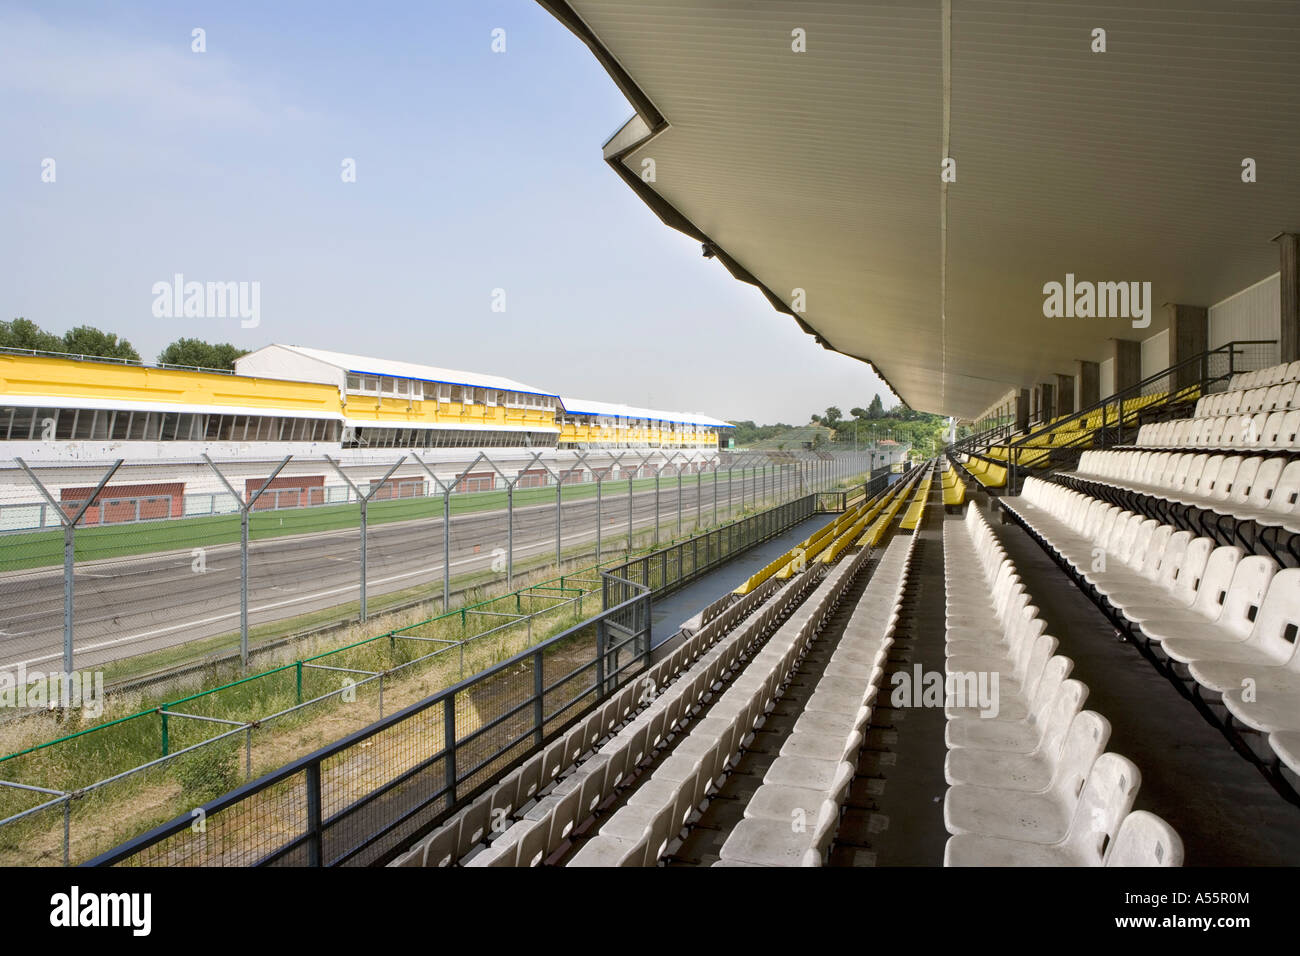 Enzo and Dino Ferrari racetrack Imola Emilia Romagna Italy - Stock Image